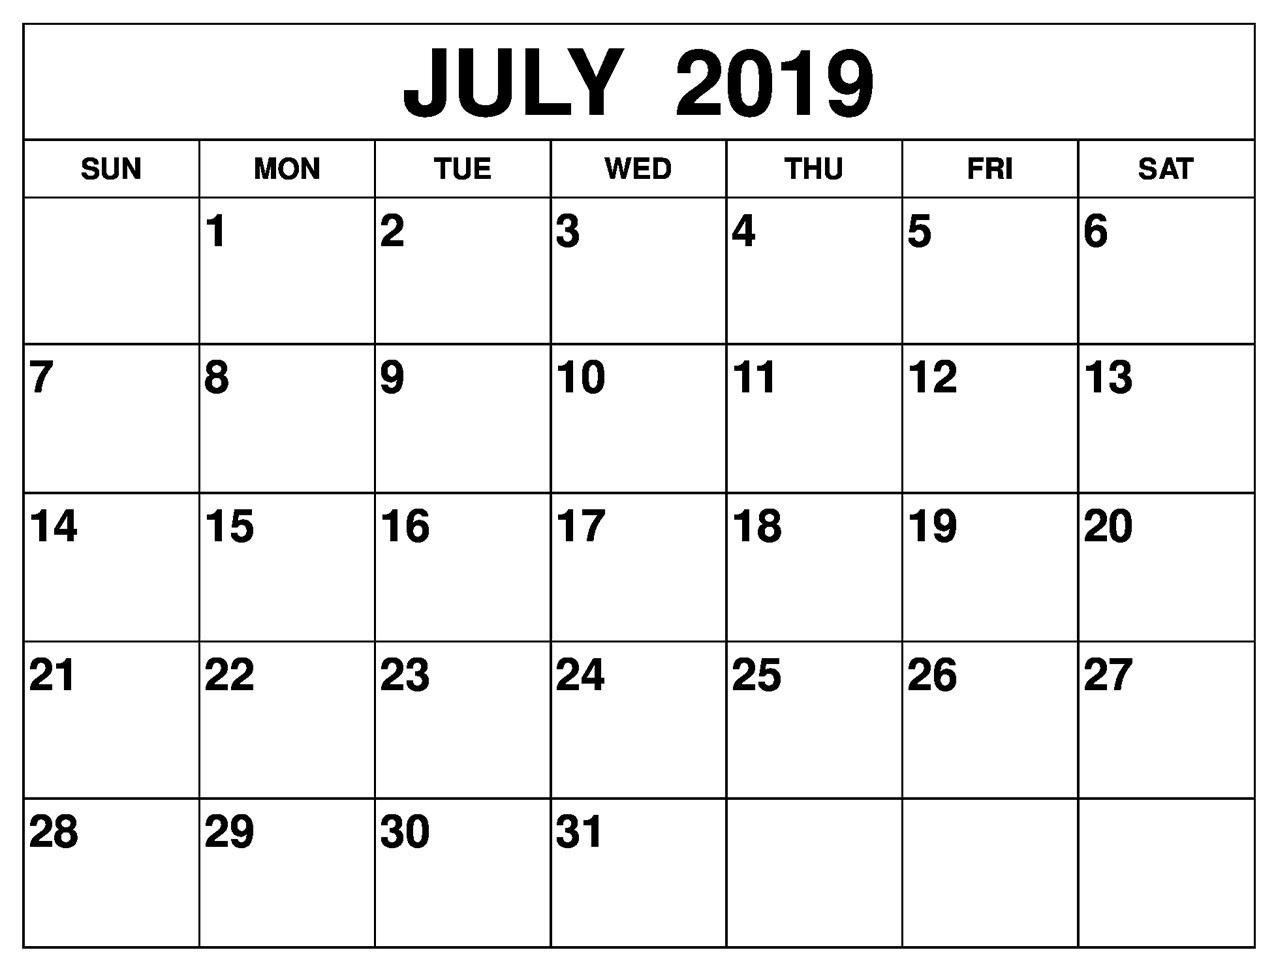 Printable Calendar November 2020 Wincalendar | Month throughout Wincalendar Calendar Maker